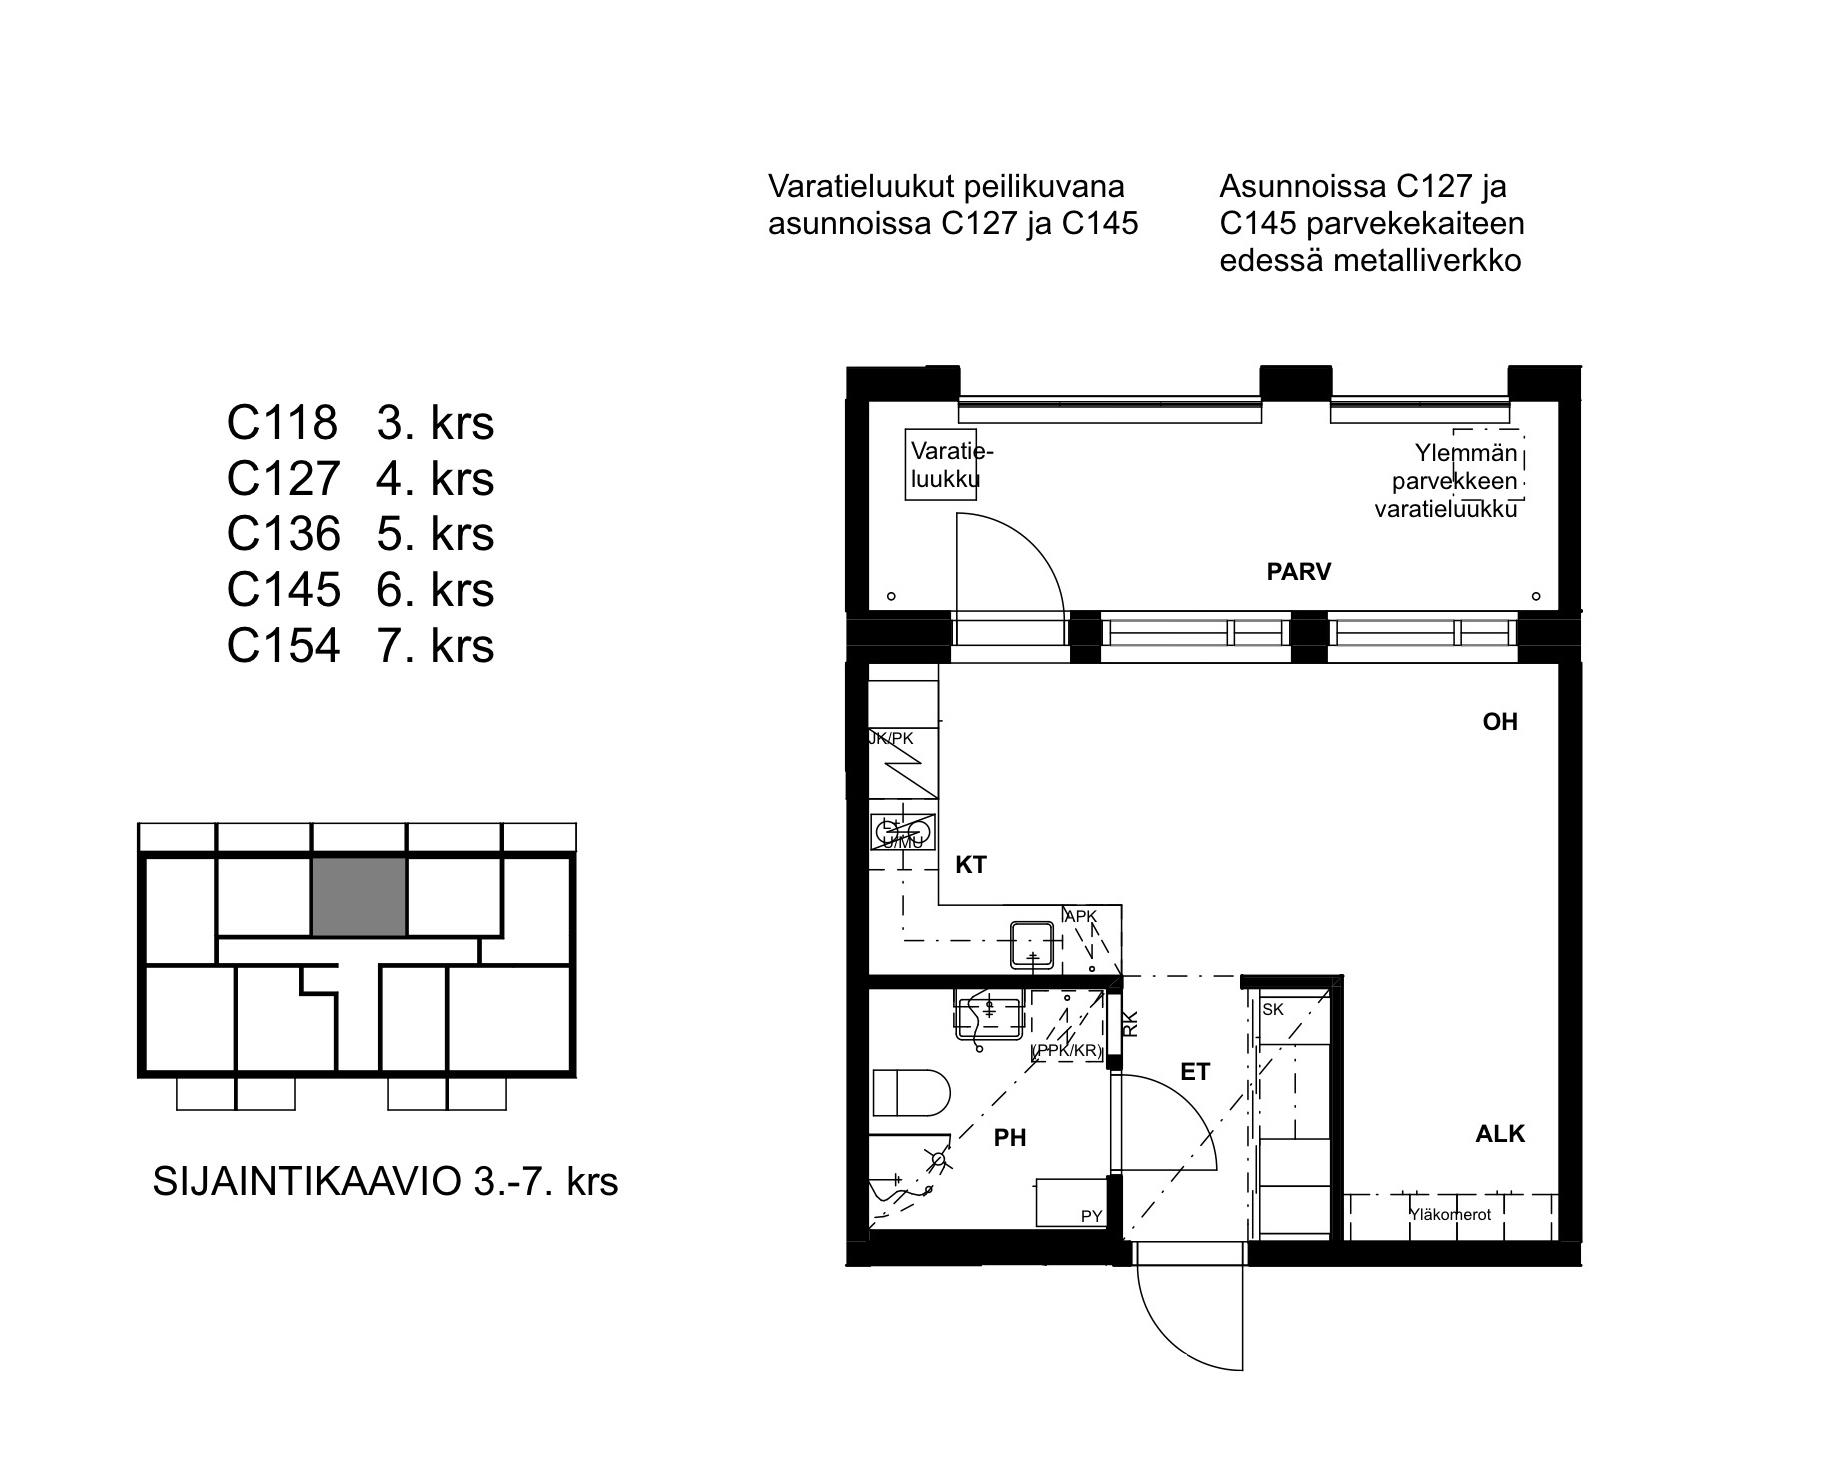 C145, 28.5 m<sup>2</sup>, 1H+ALK+KT